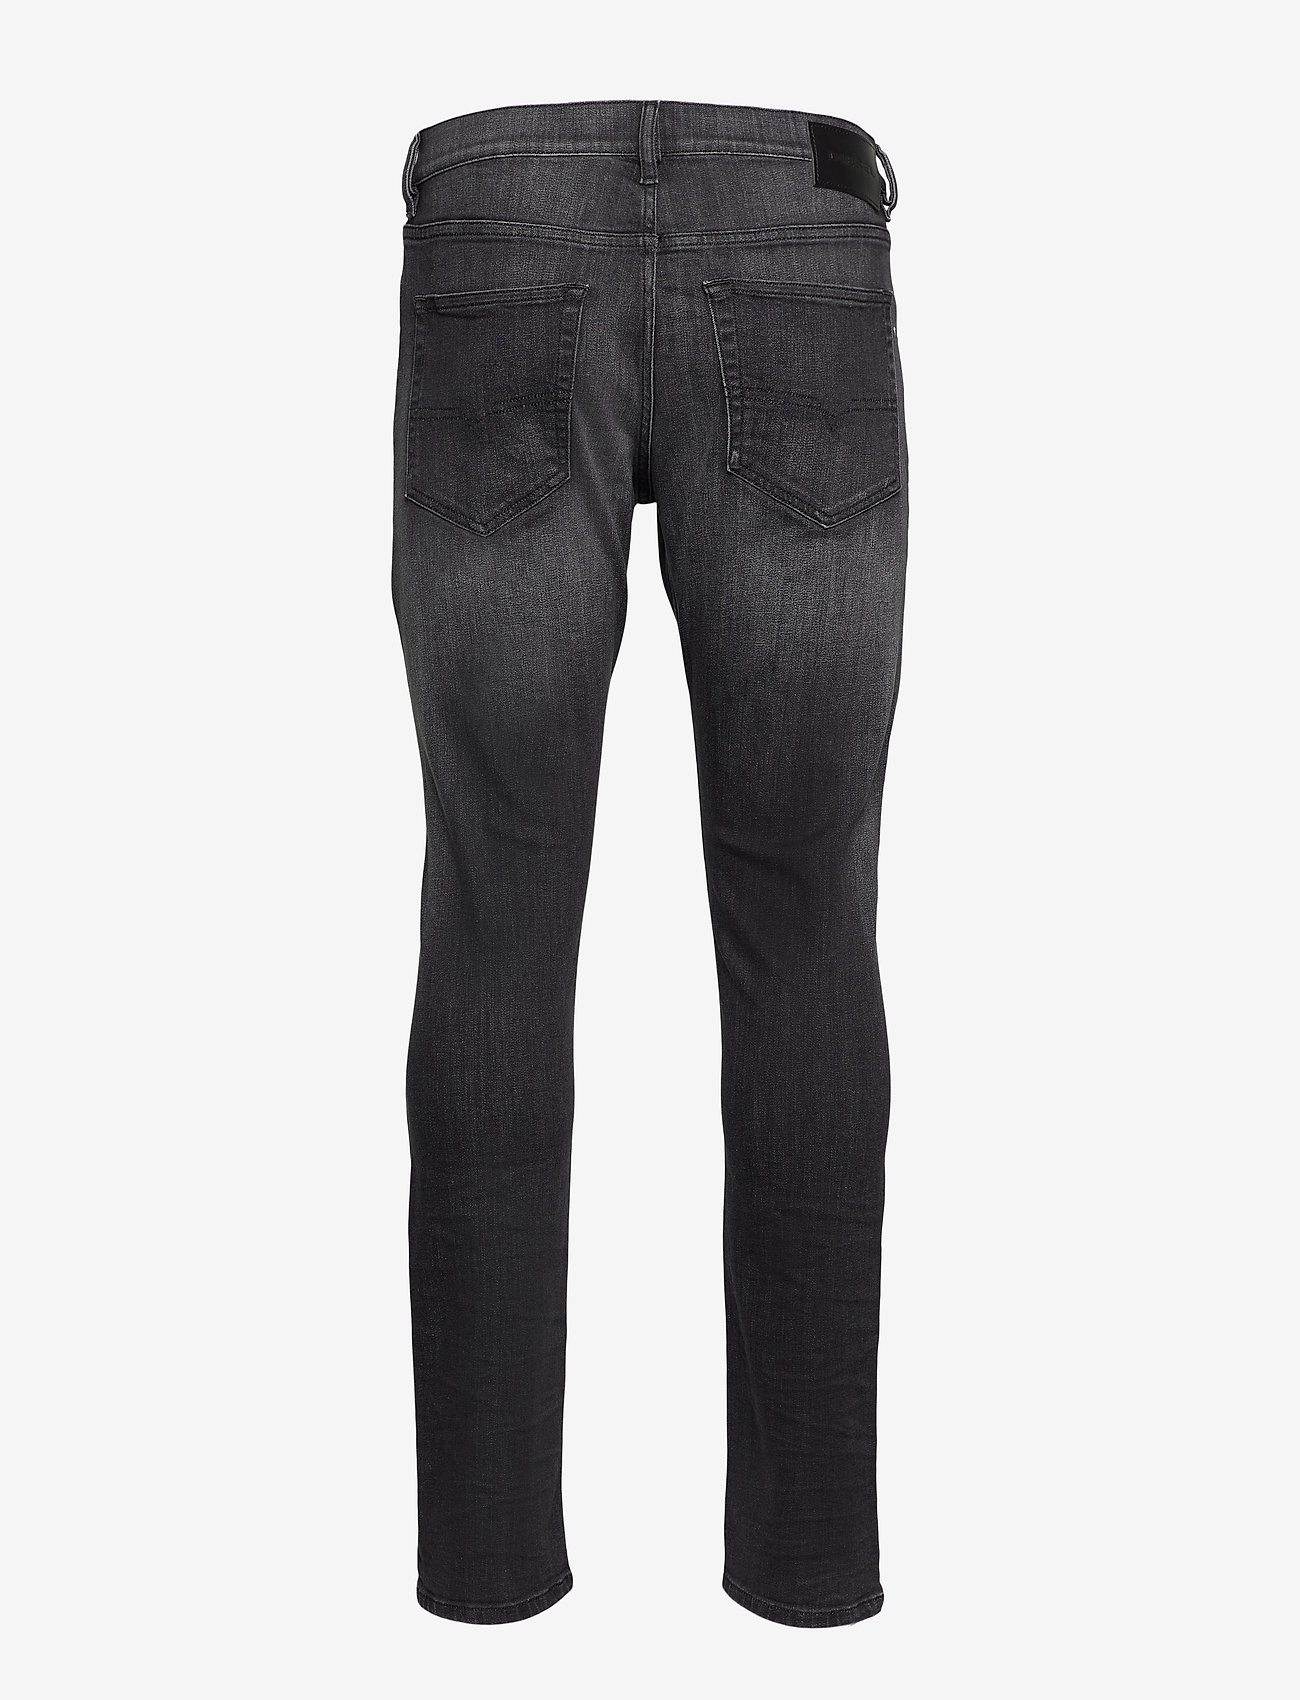 Diesel Men - D-LUSTER L.32 TROUSERS - slim jeans - camel - 1